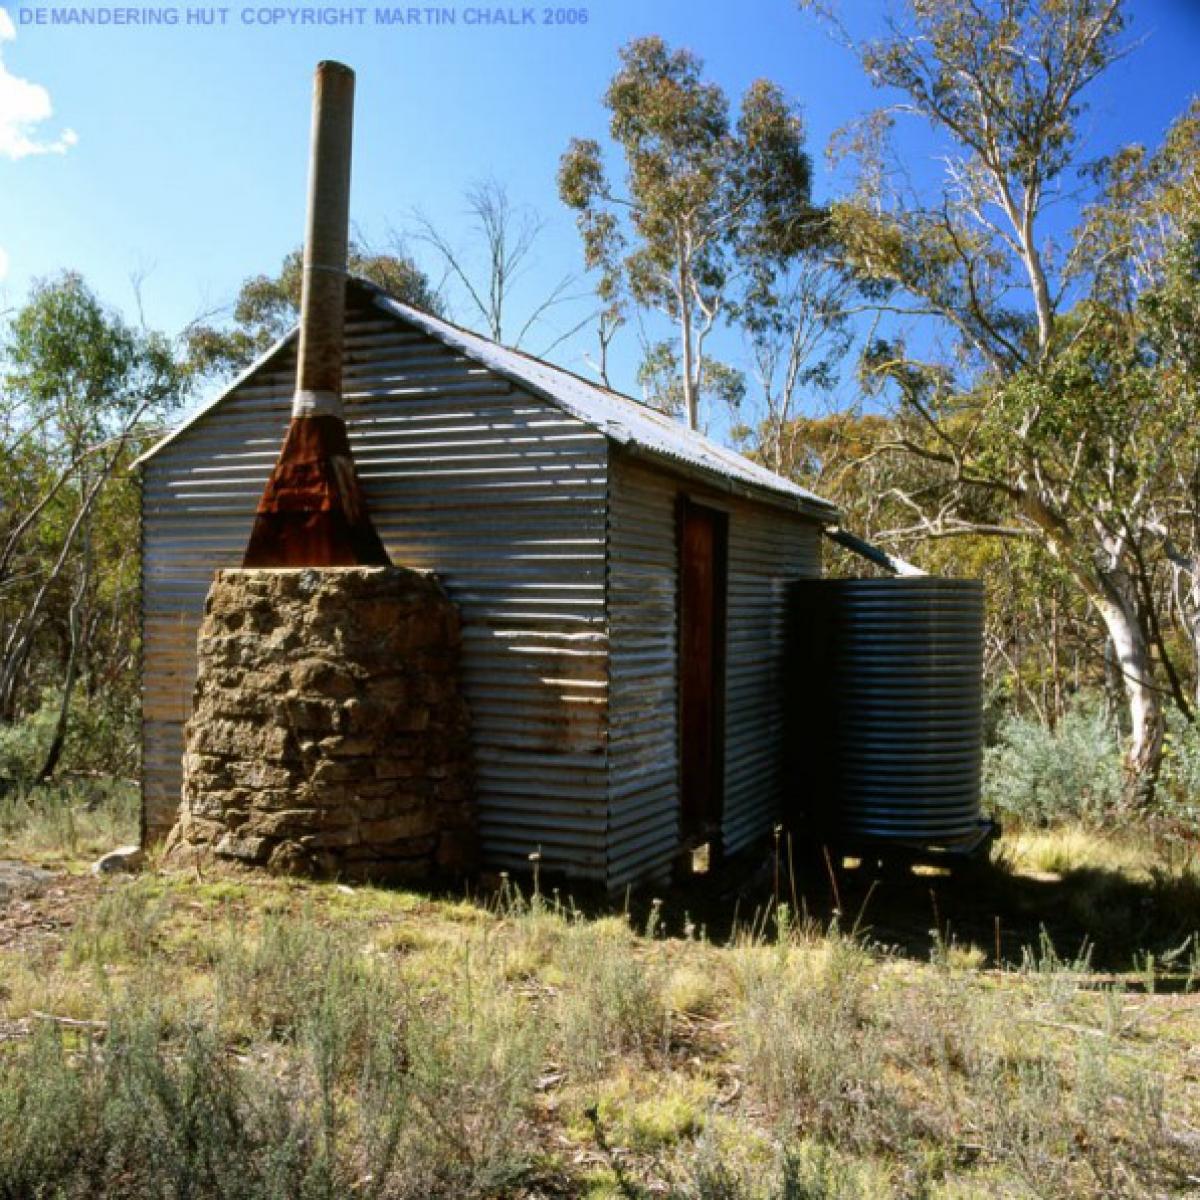 Demandering Hut